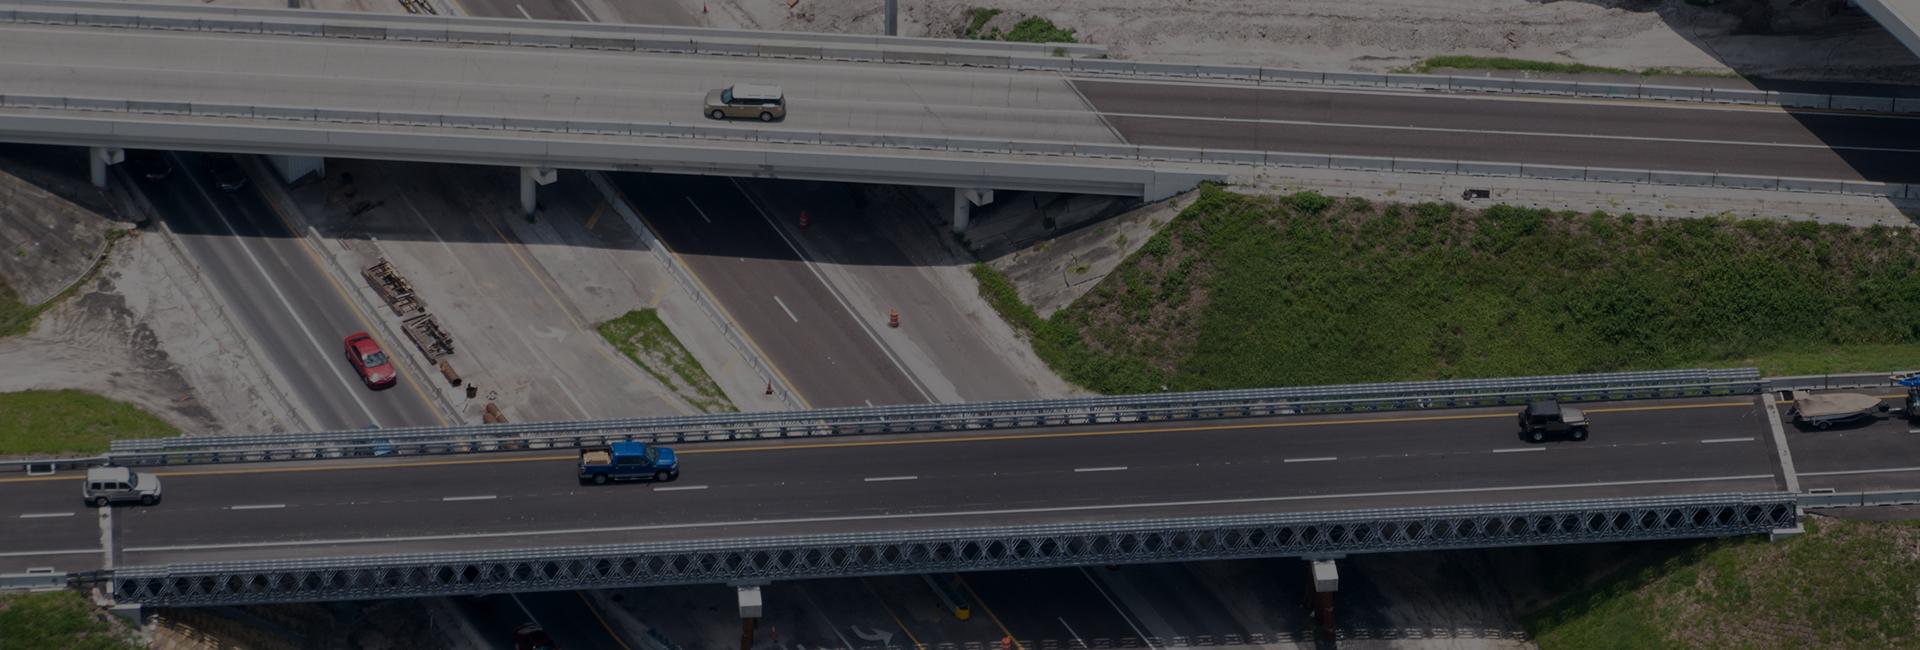 Temporary Rental Modular Bridge